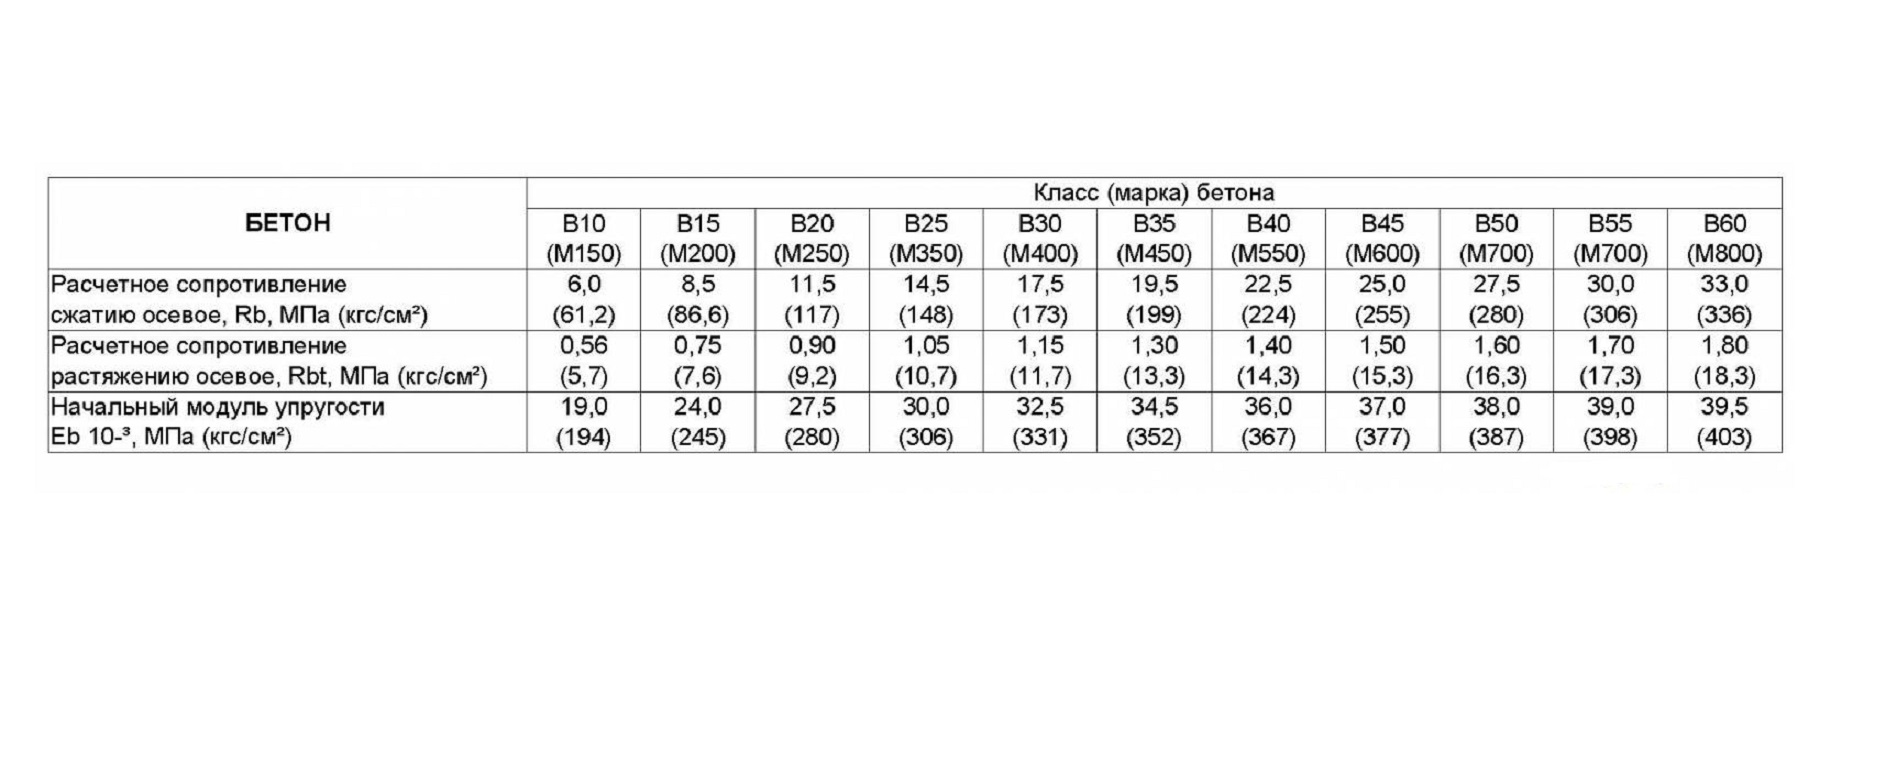 Таблица расчета на нагрузки